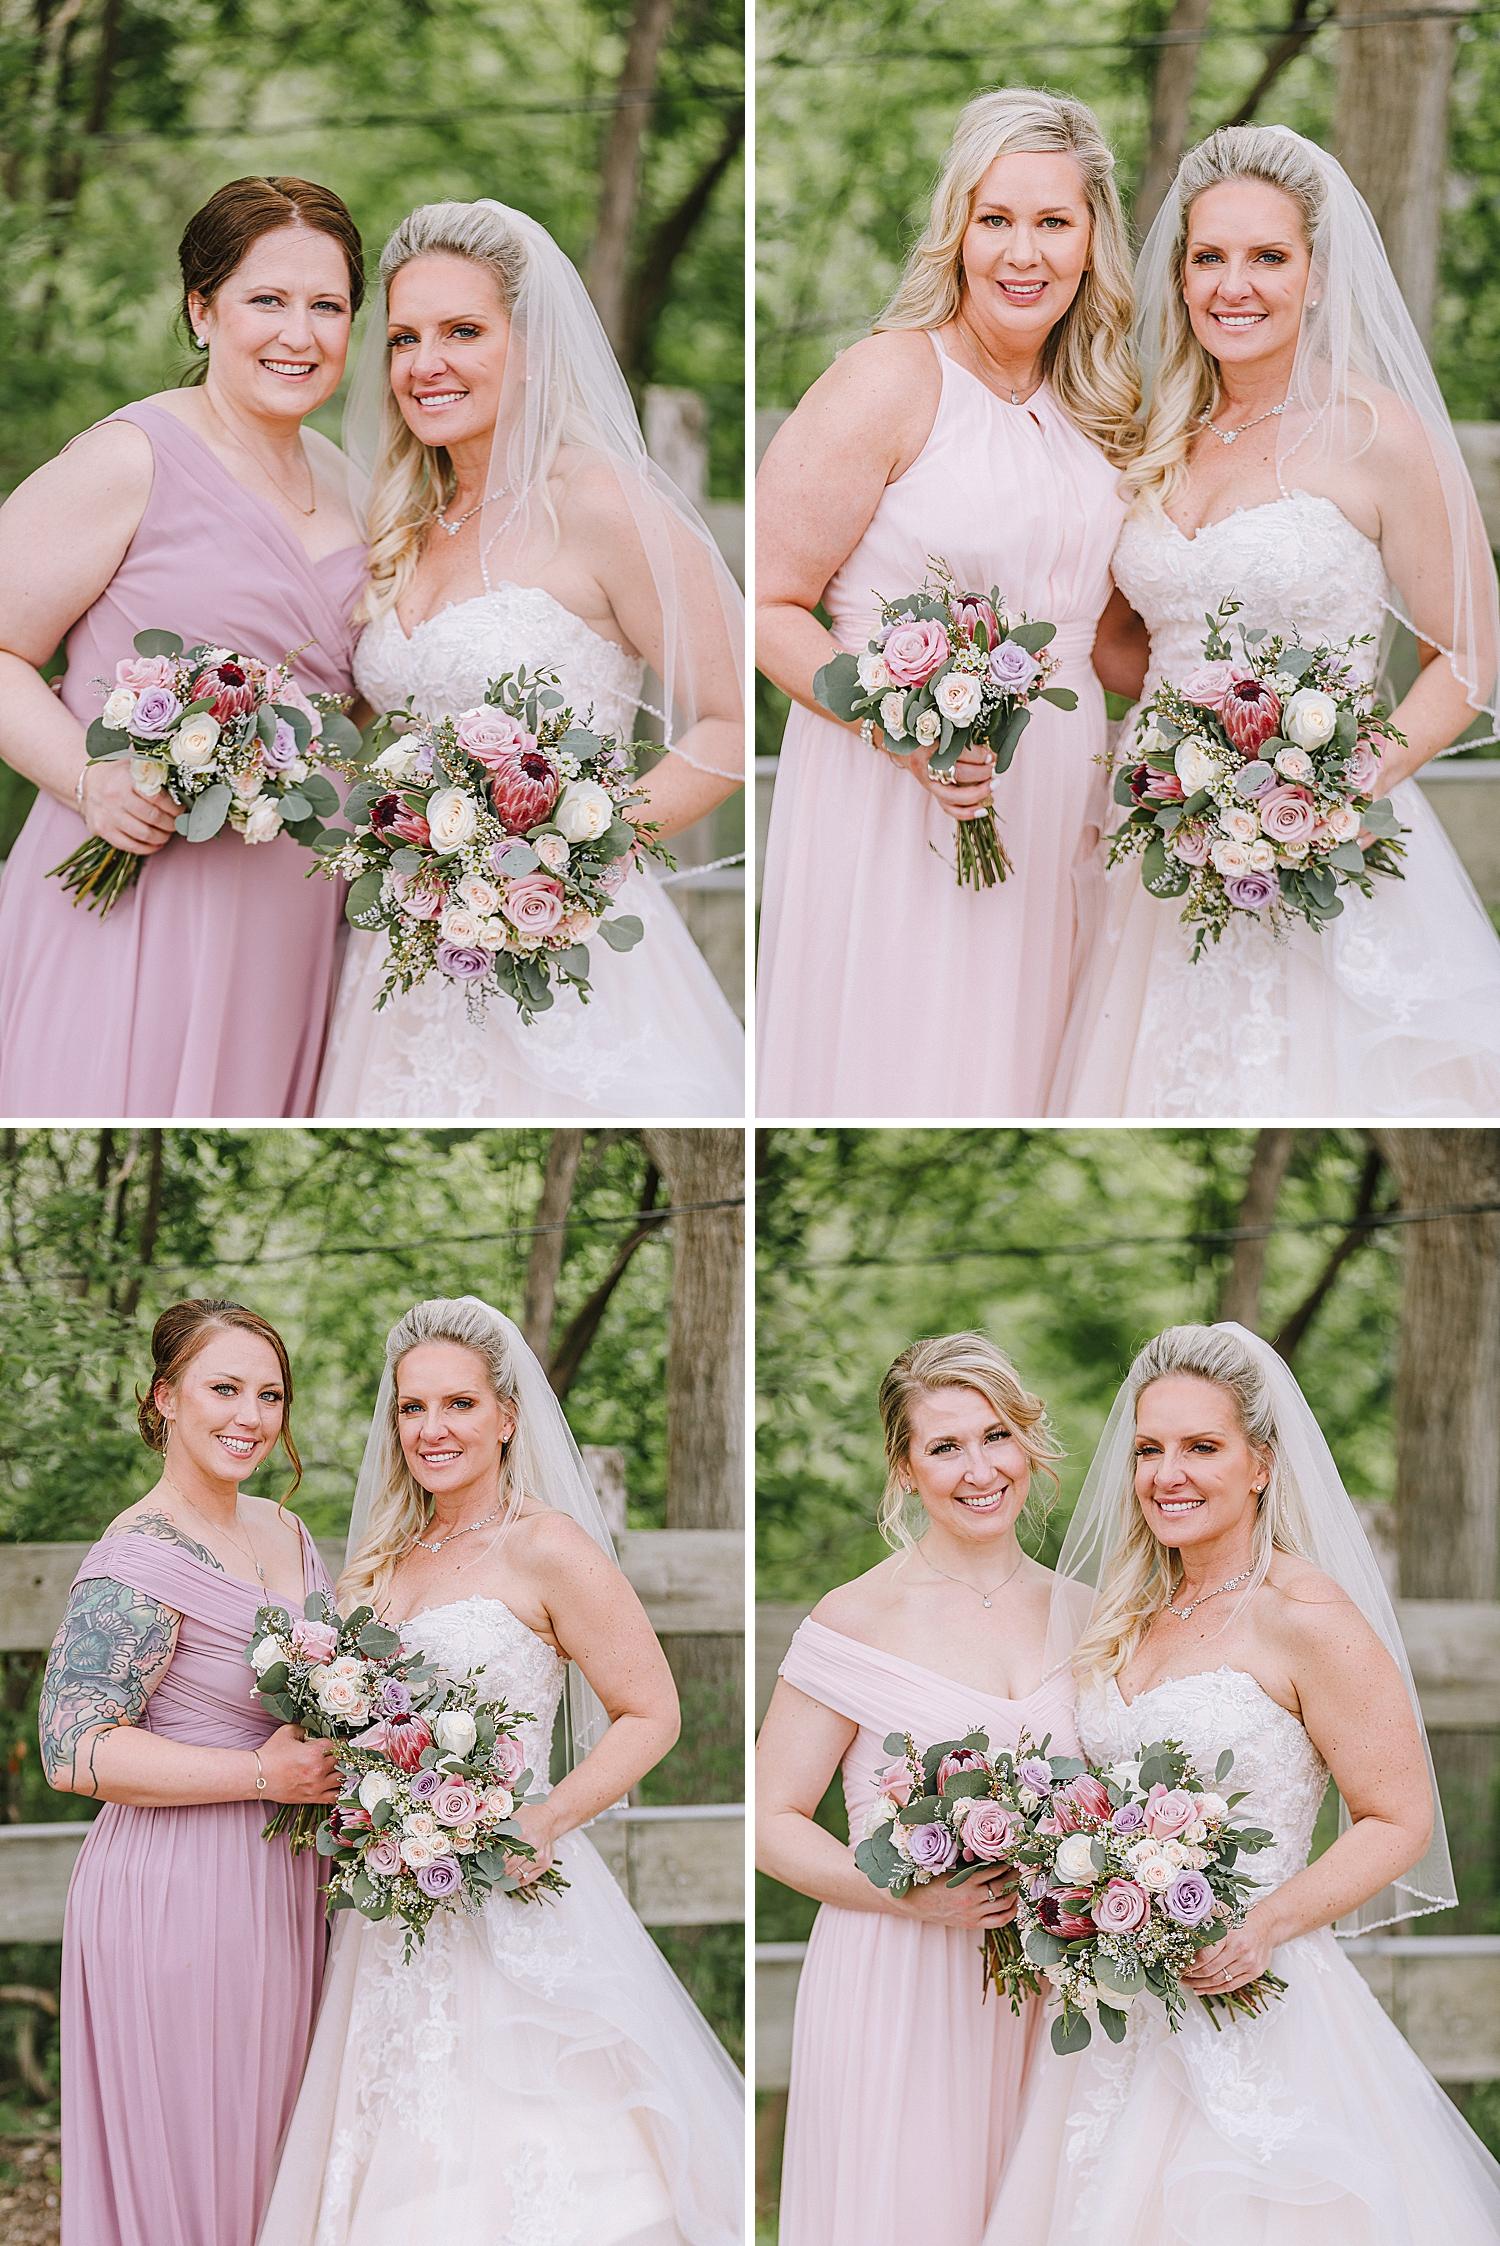 Rio-Cibilo-Ranch-Marion-Texas-Wedding-Rustic-Blush-Rose-Quartz-Details-Carly-Barton-Photography_0006.jpg